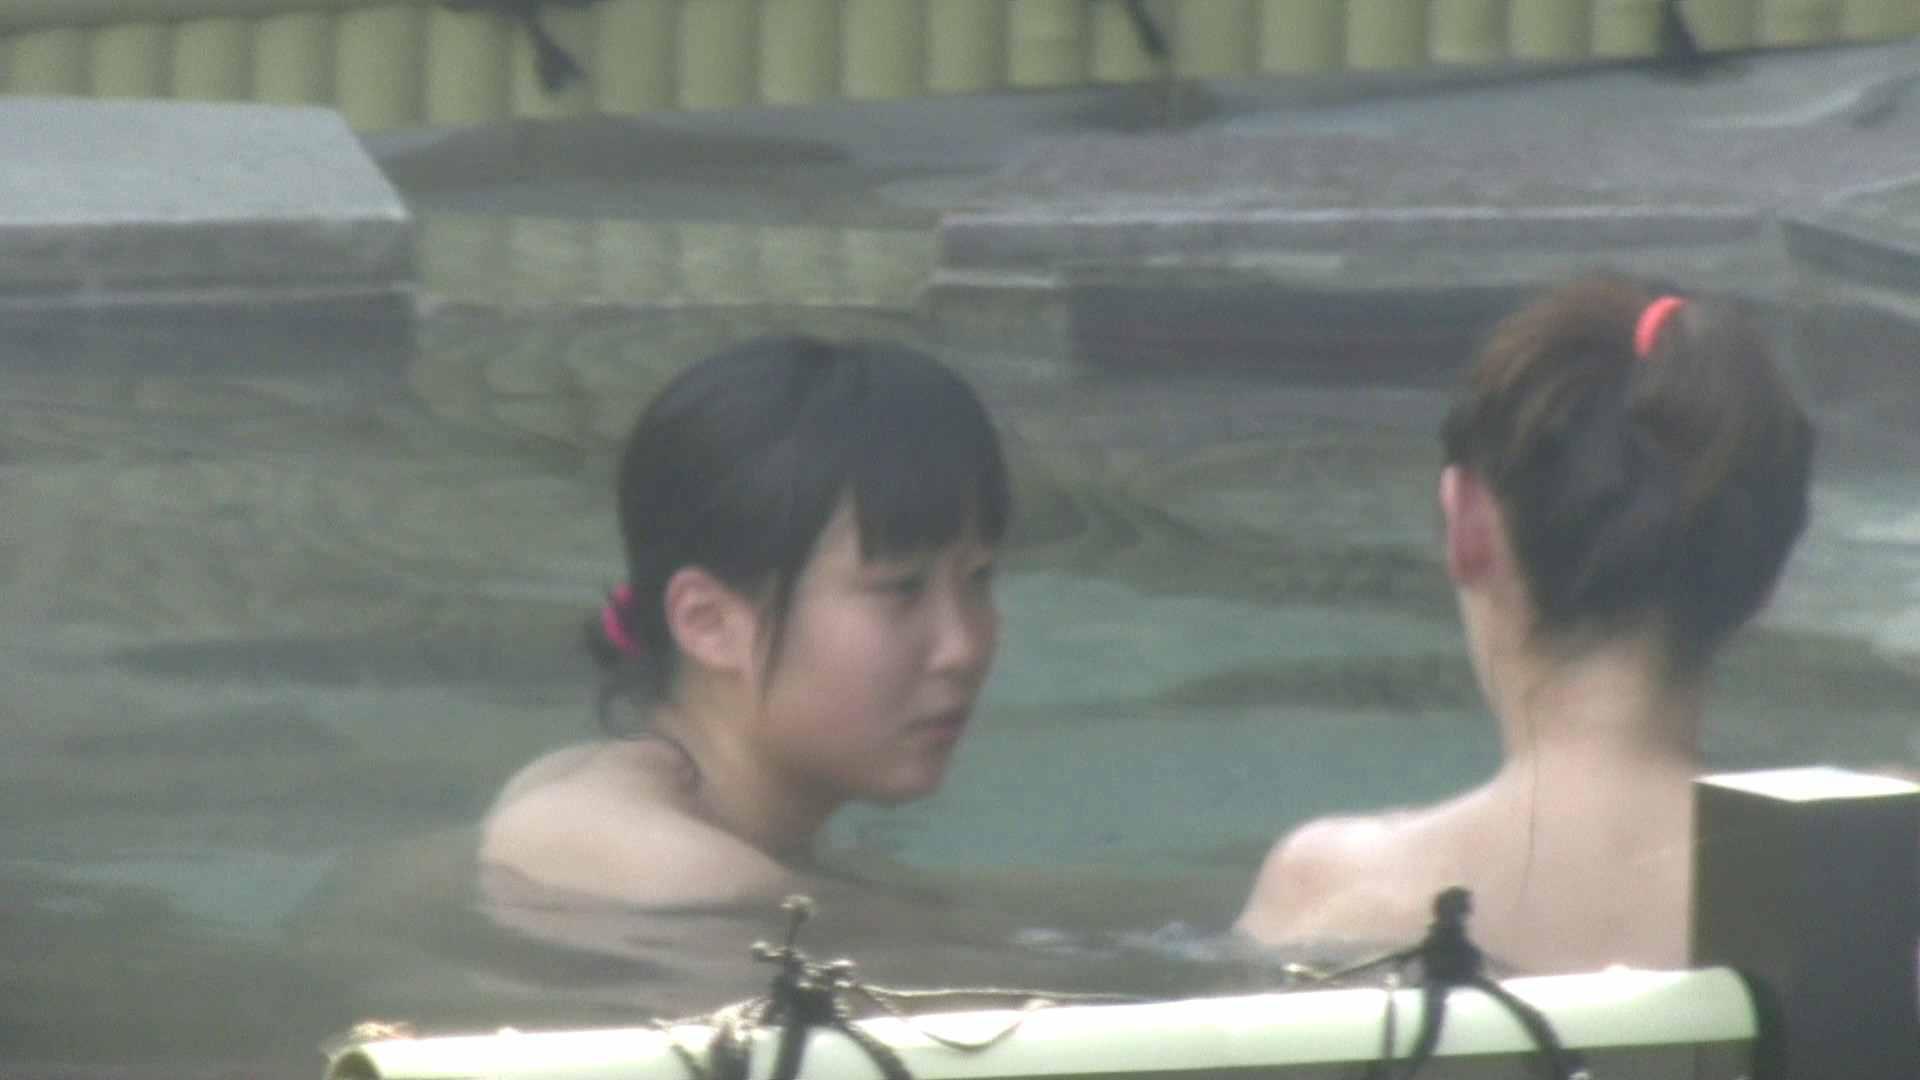 Aquaな露天風呂Vol.196 HなOL | 盗撮  91pic 83